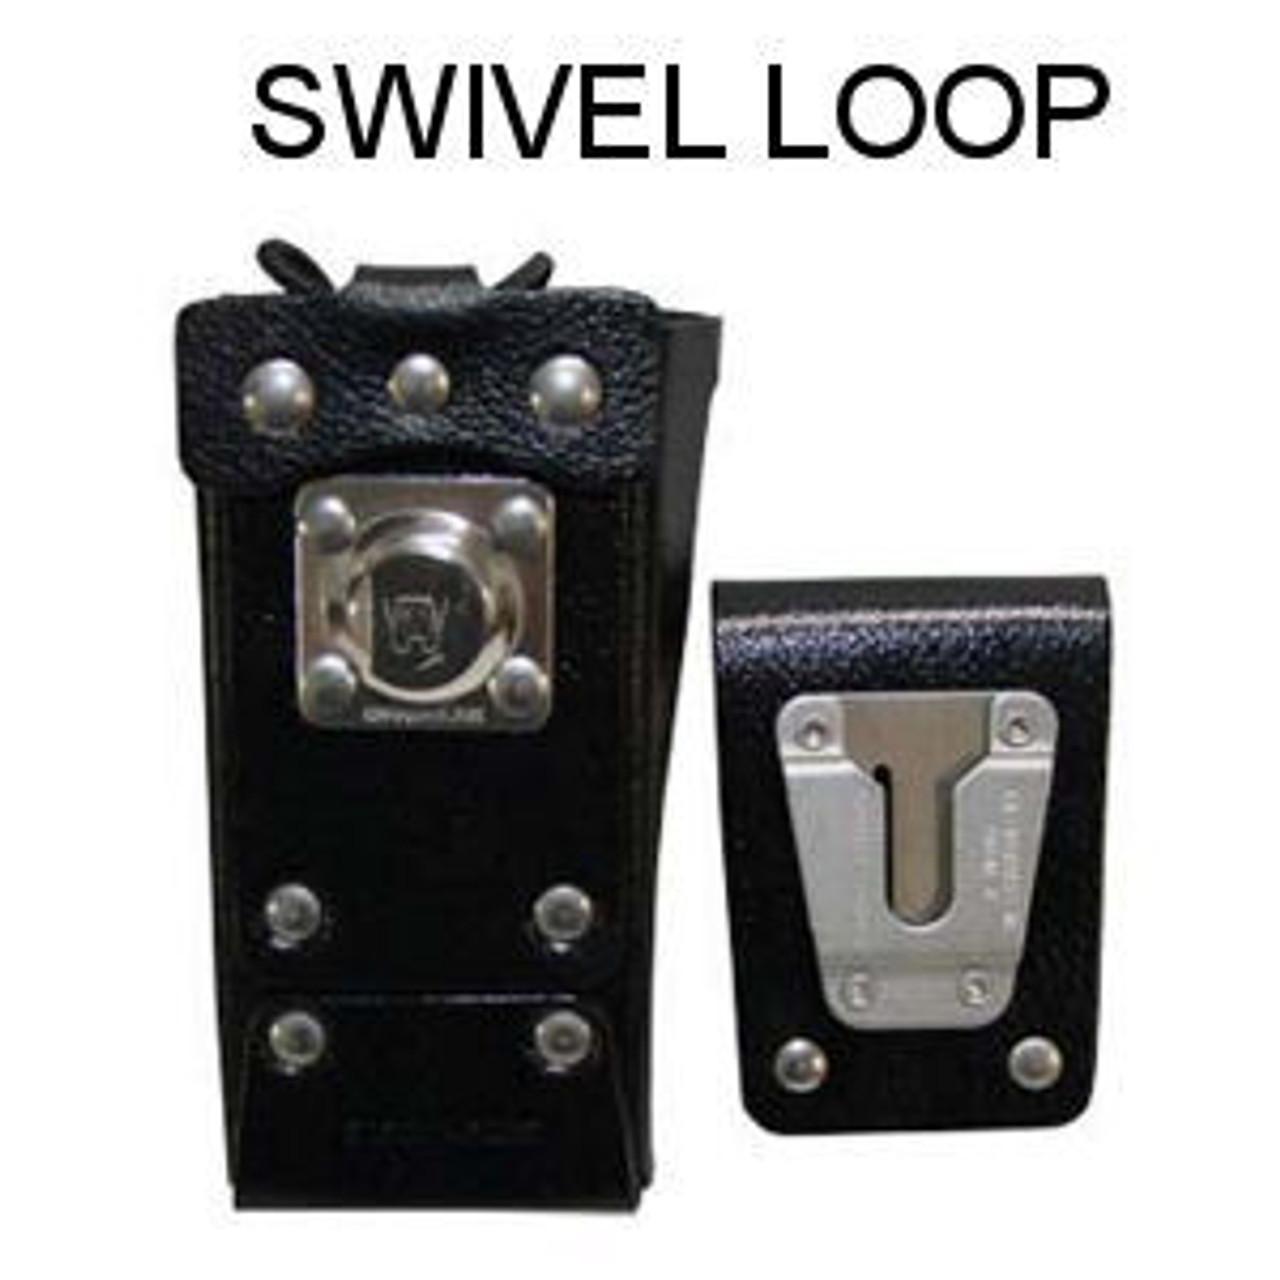 Motorola APX6000 Custom Radio Case With Swivel Loop